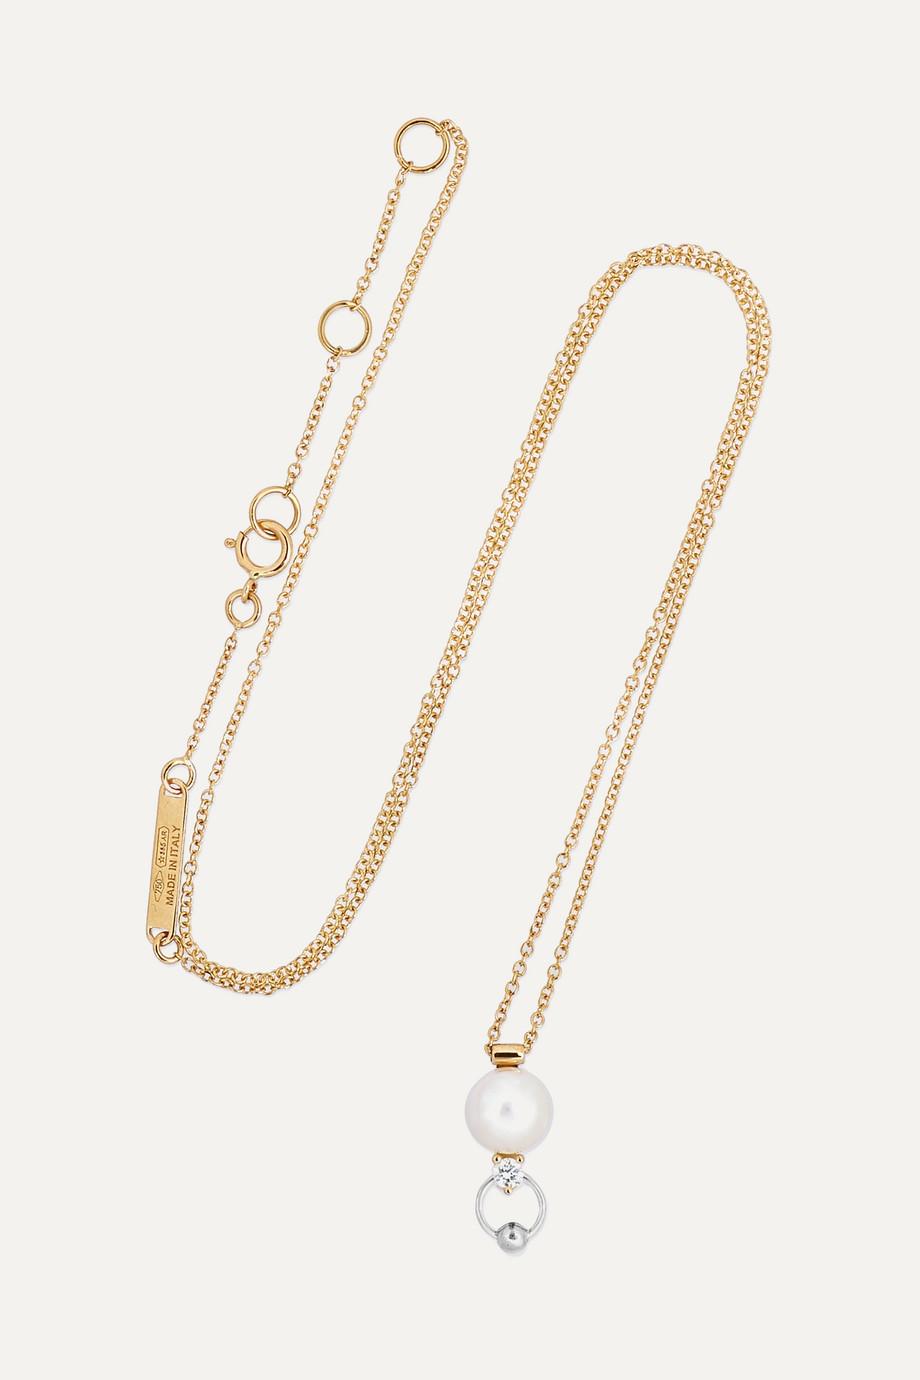 Delfina Delettrez 18-karat yellow and white gold diamond and pearl necklace